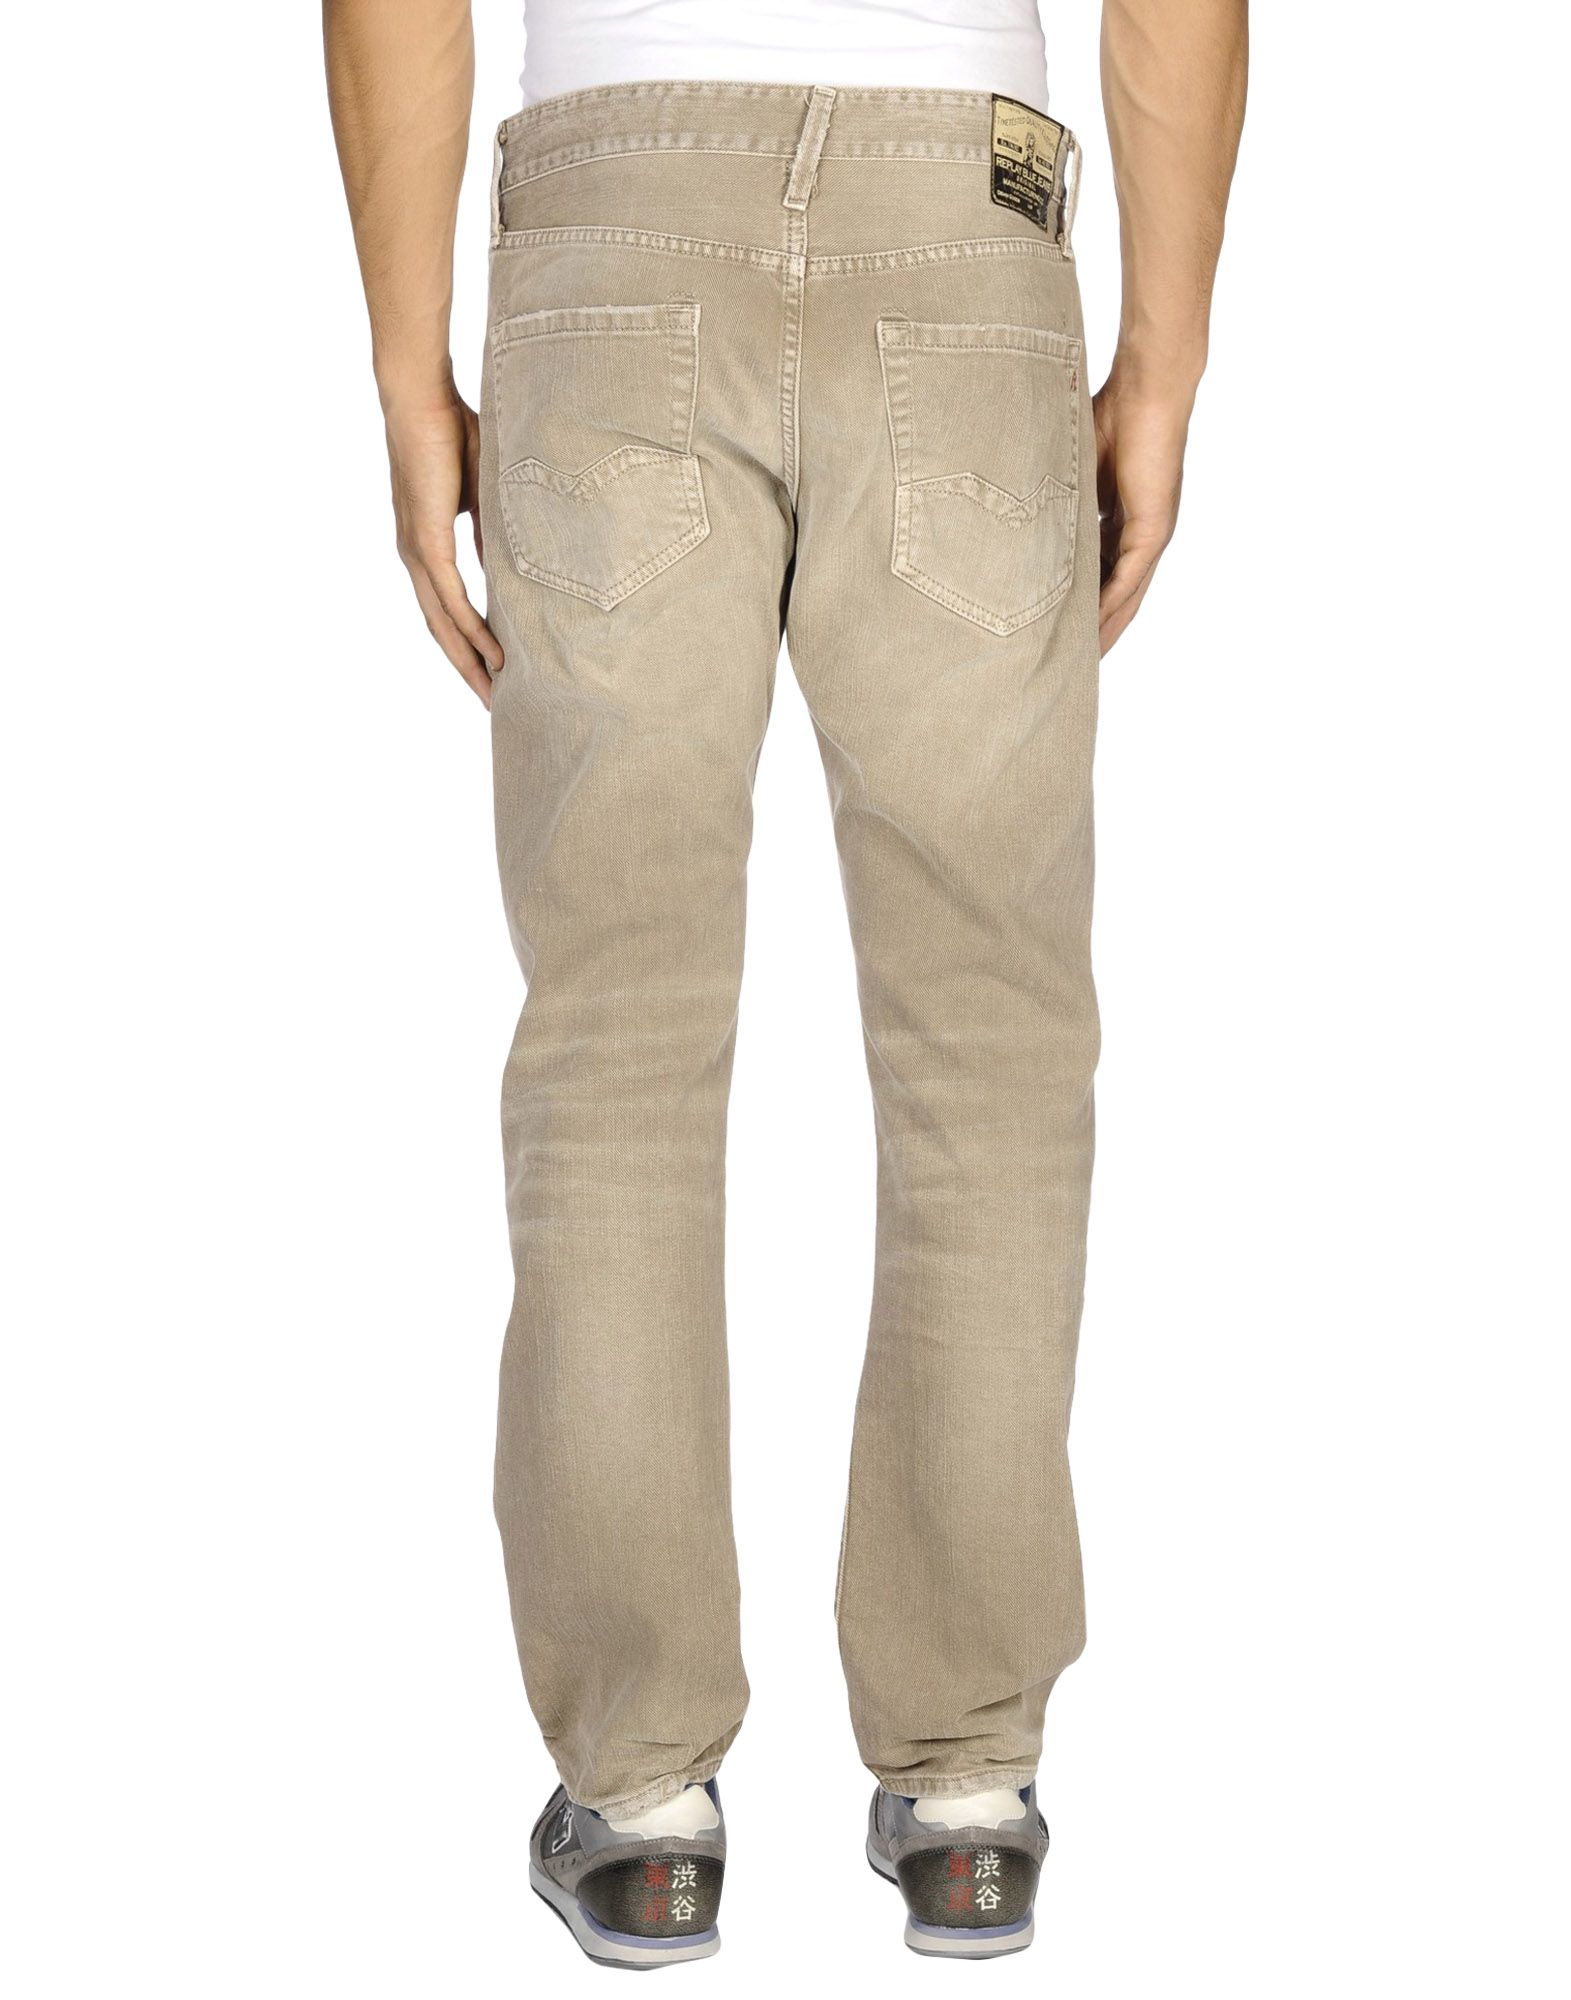 Replay Denim Trousers in Beige for Men | Lyst